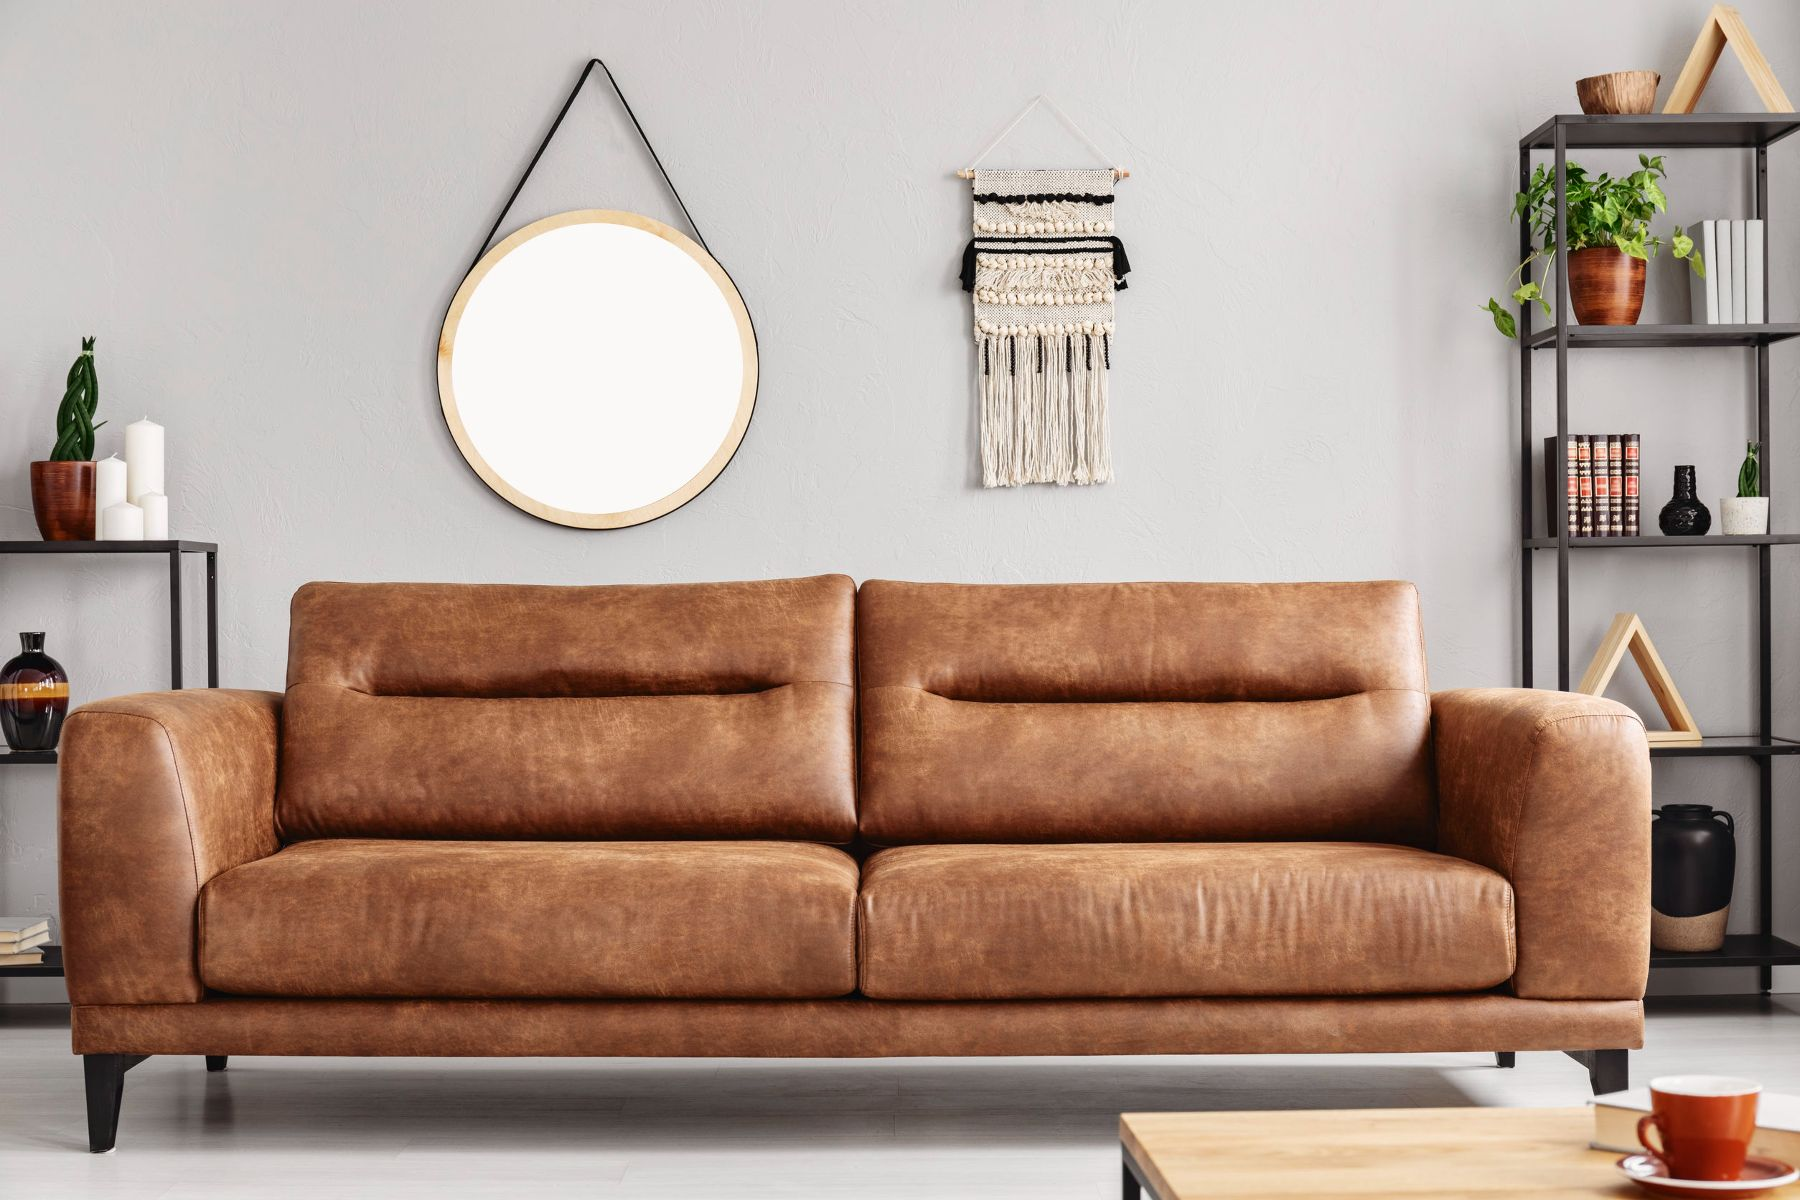 Decora la pared sobre tu sofá